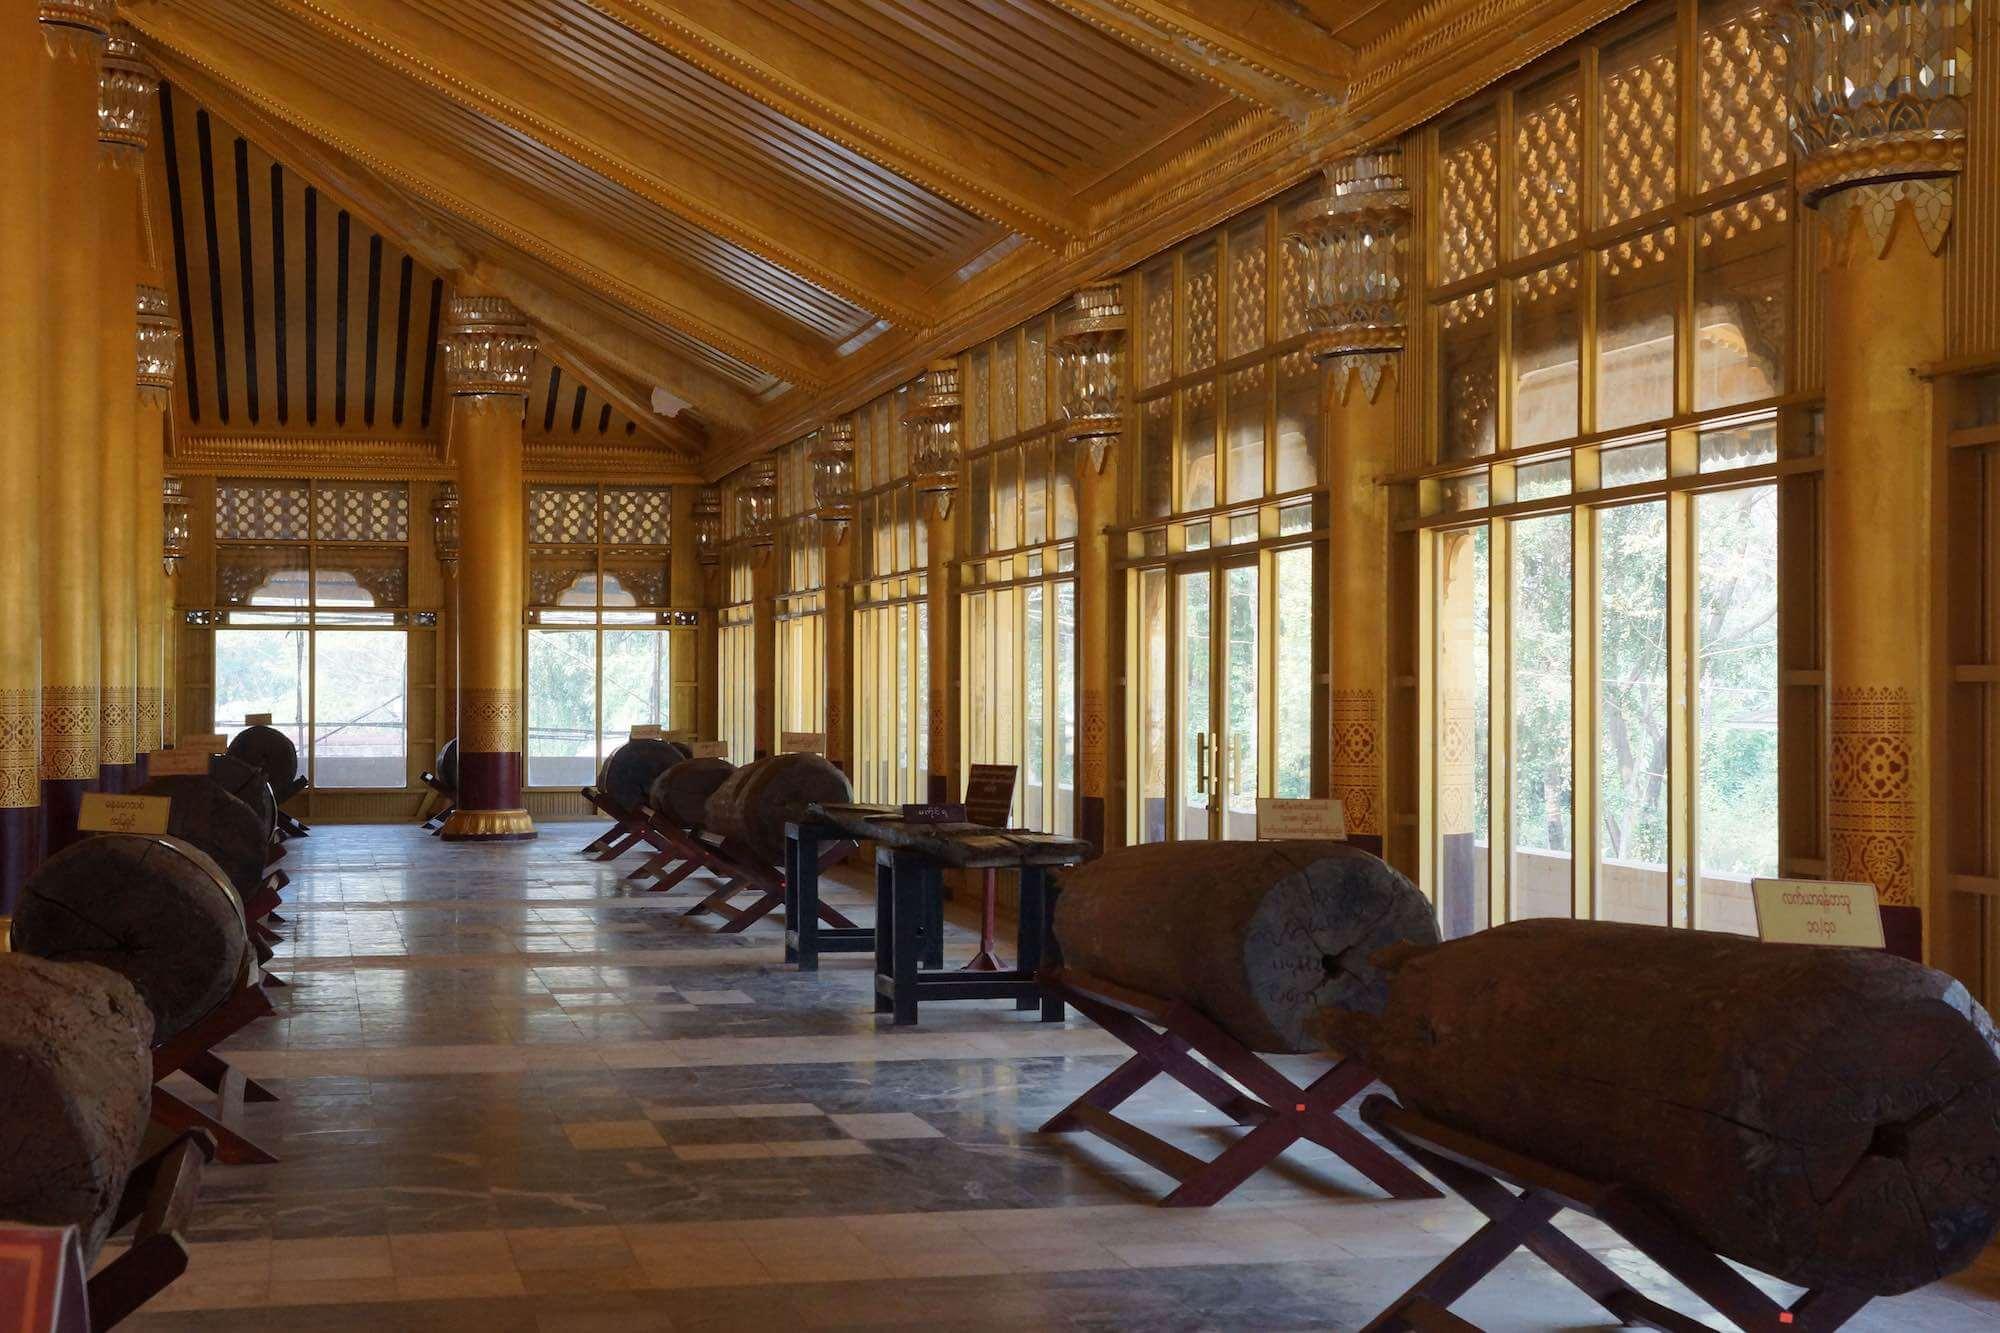 kanbawzathadi-palace-2